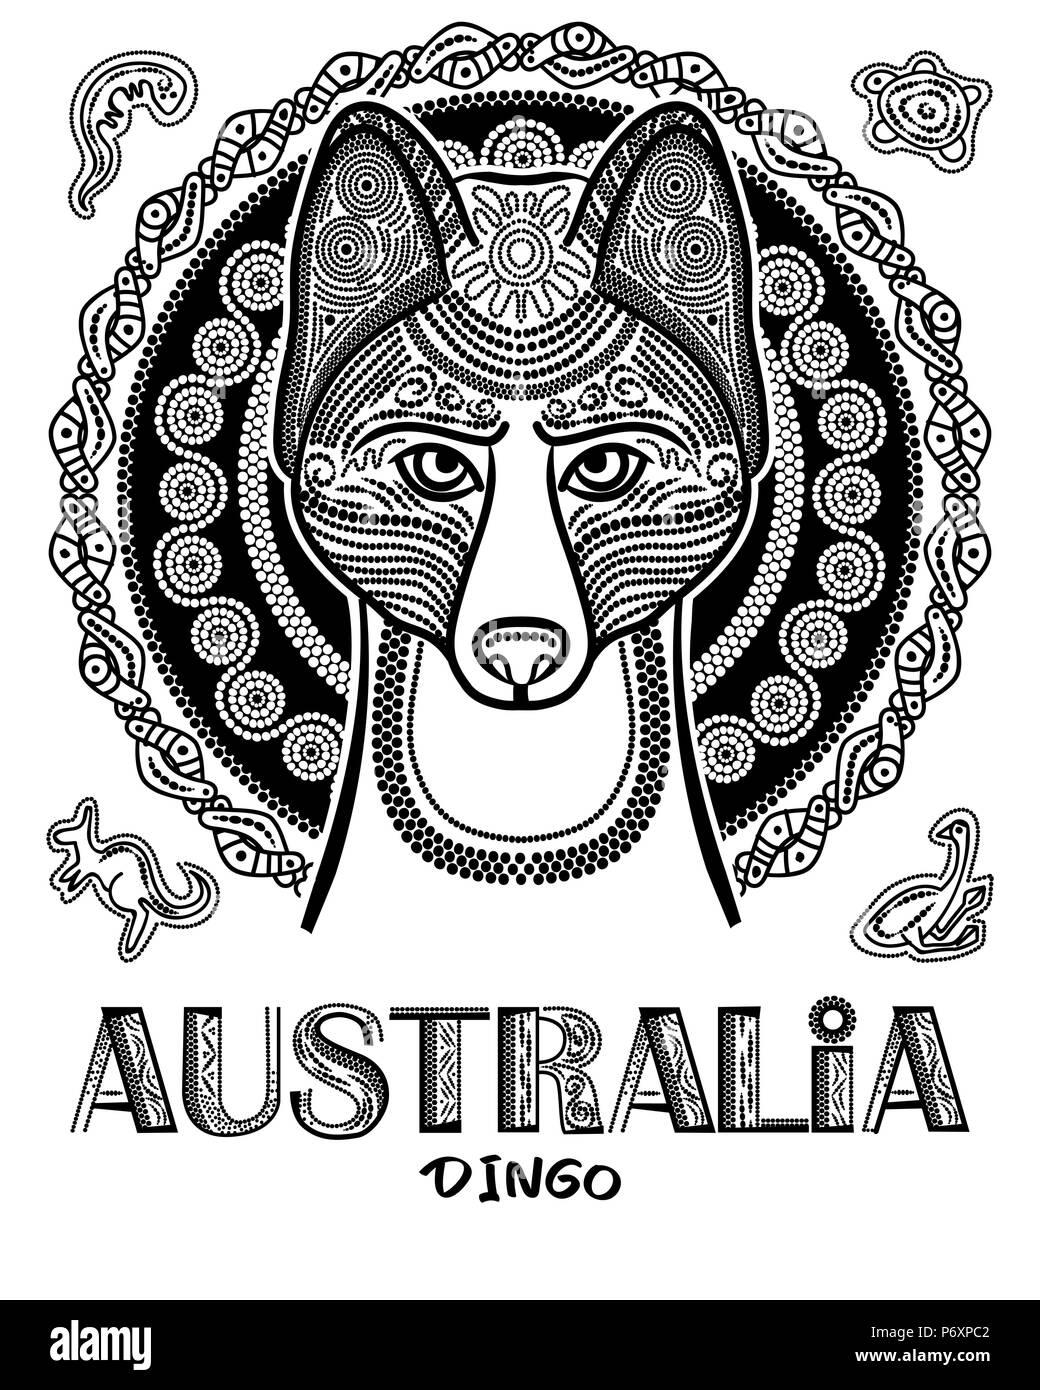 Vector image of dog dingo in ethnic style. Australian Aboriginal style - Stock Image